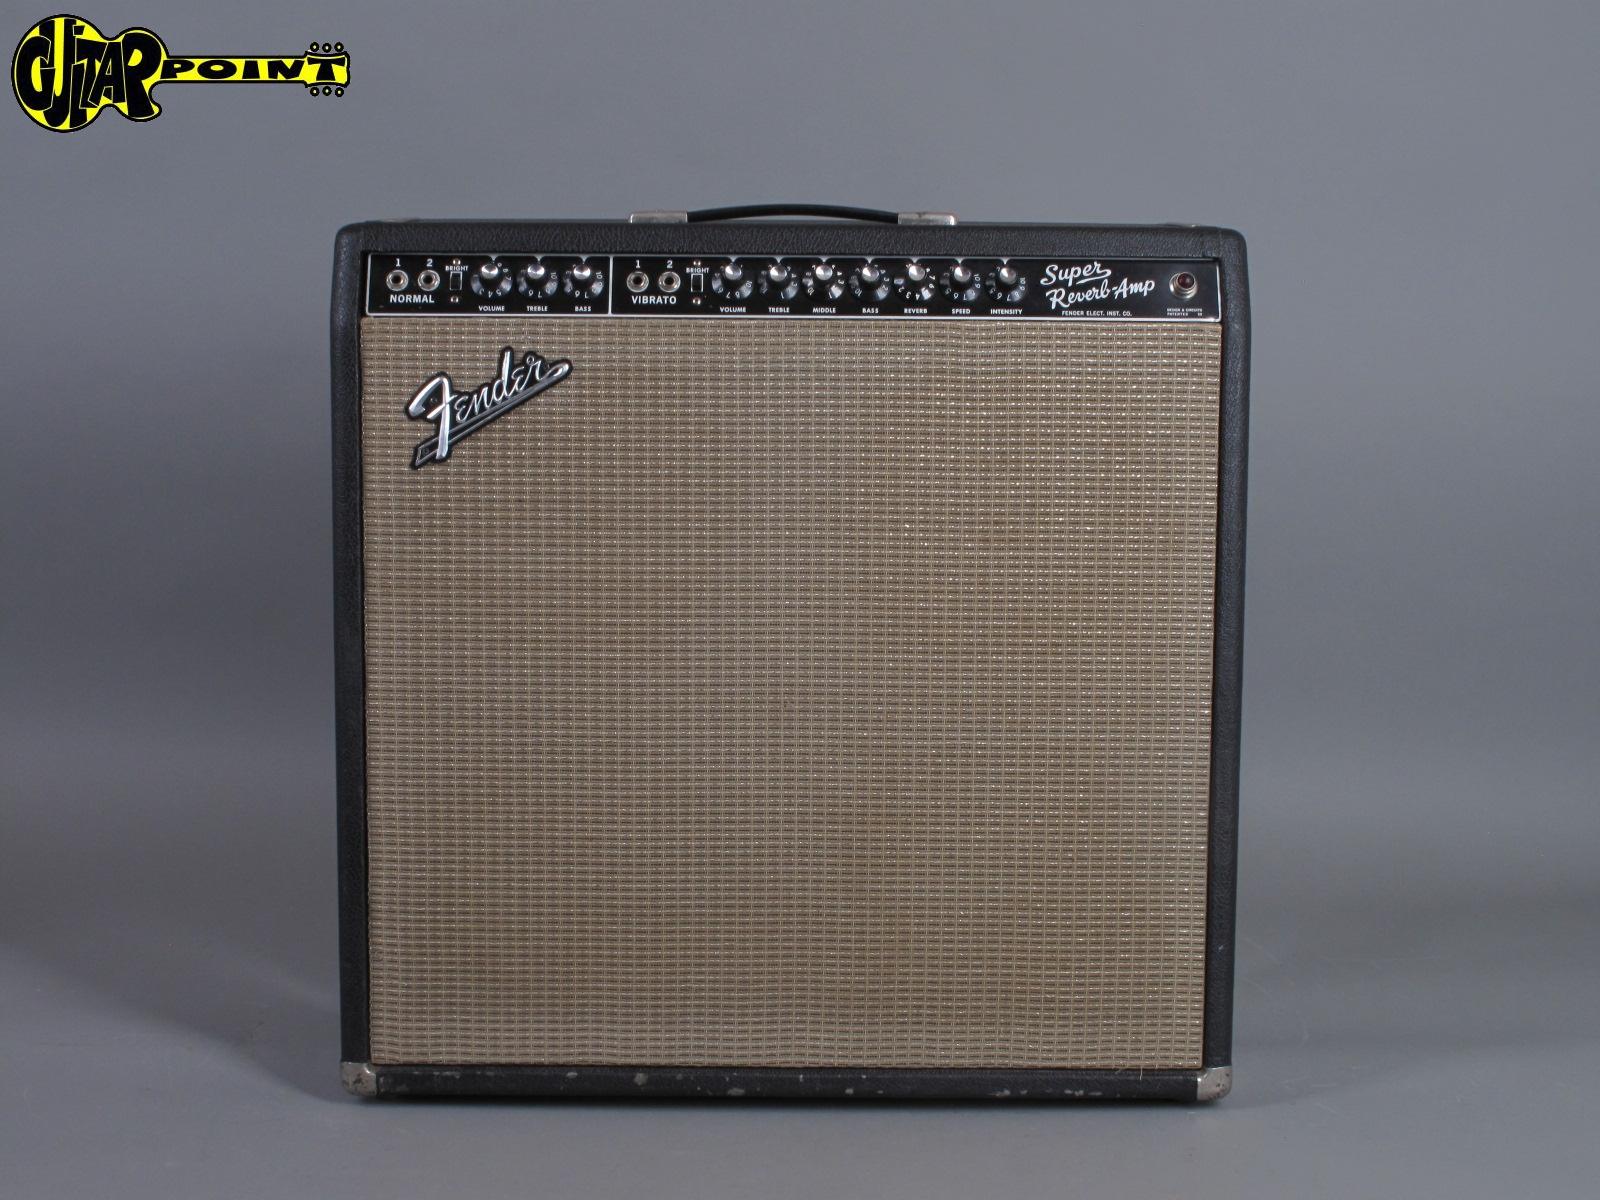 1964 Fender Super Reverb 4x10